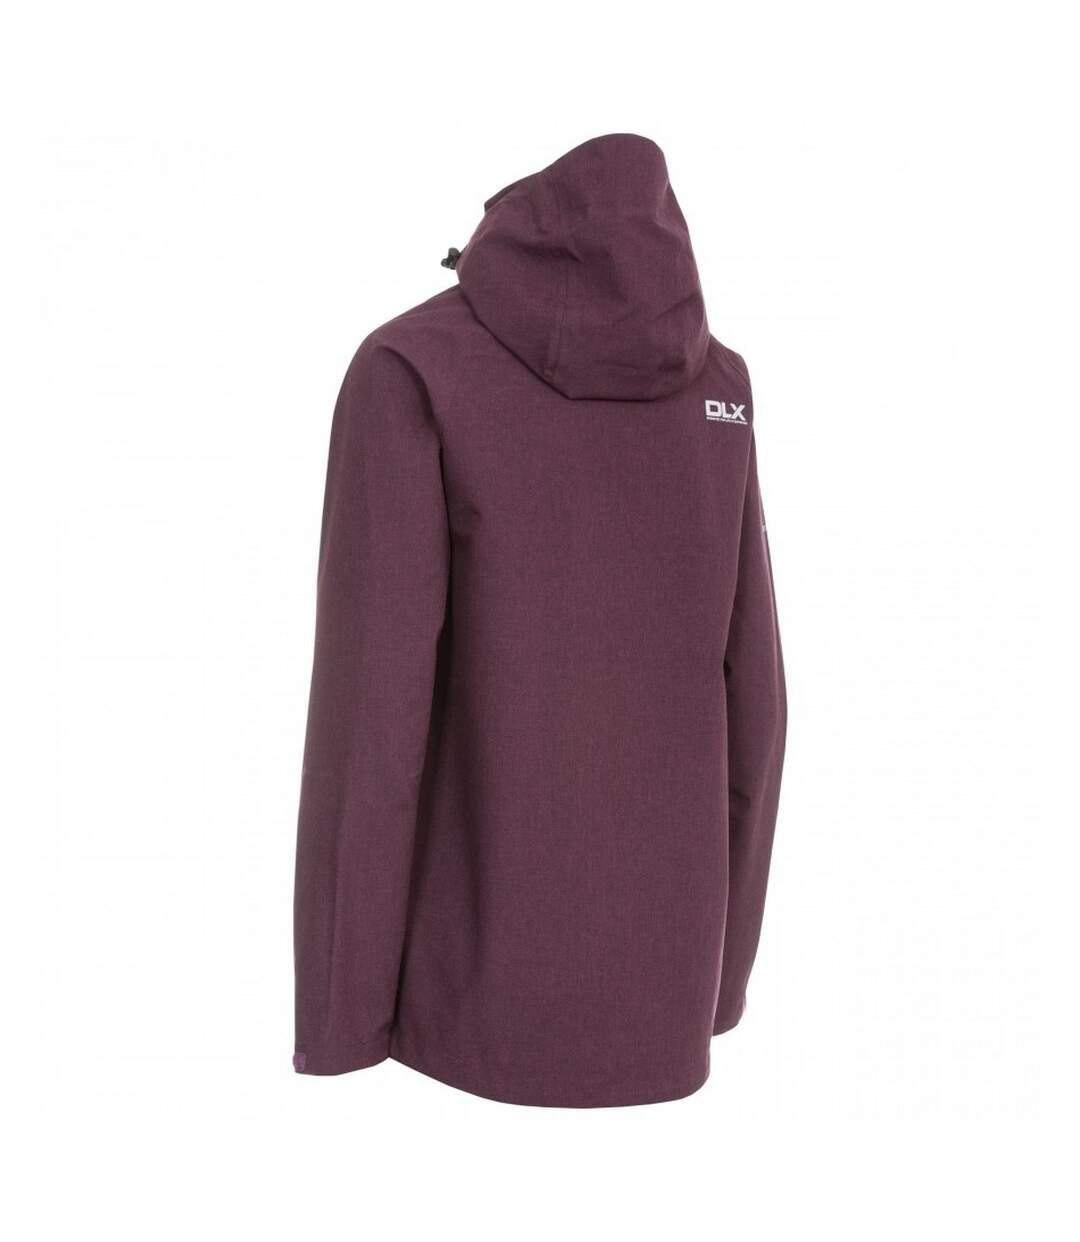 Trespass Womens/Ladies Gita II Waterproof Shell Jacket (Blackberry Marl) - UTTP4131